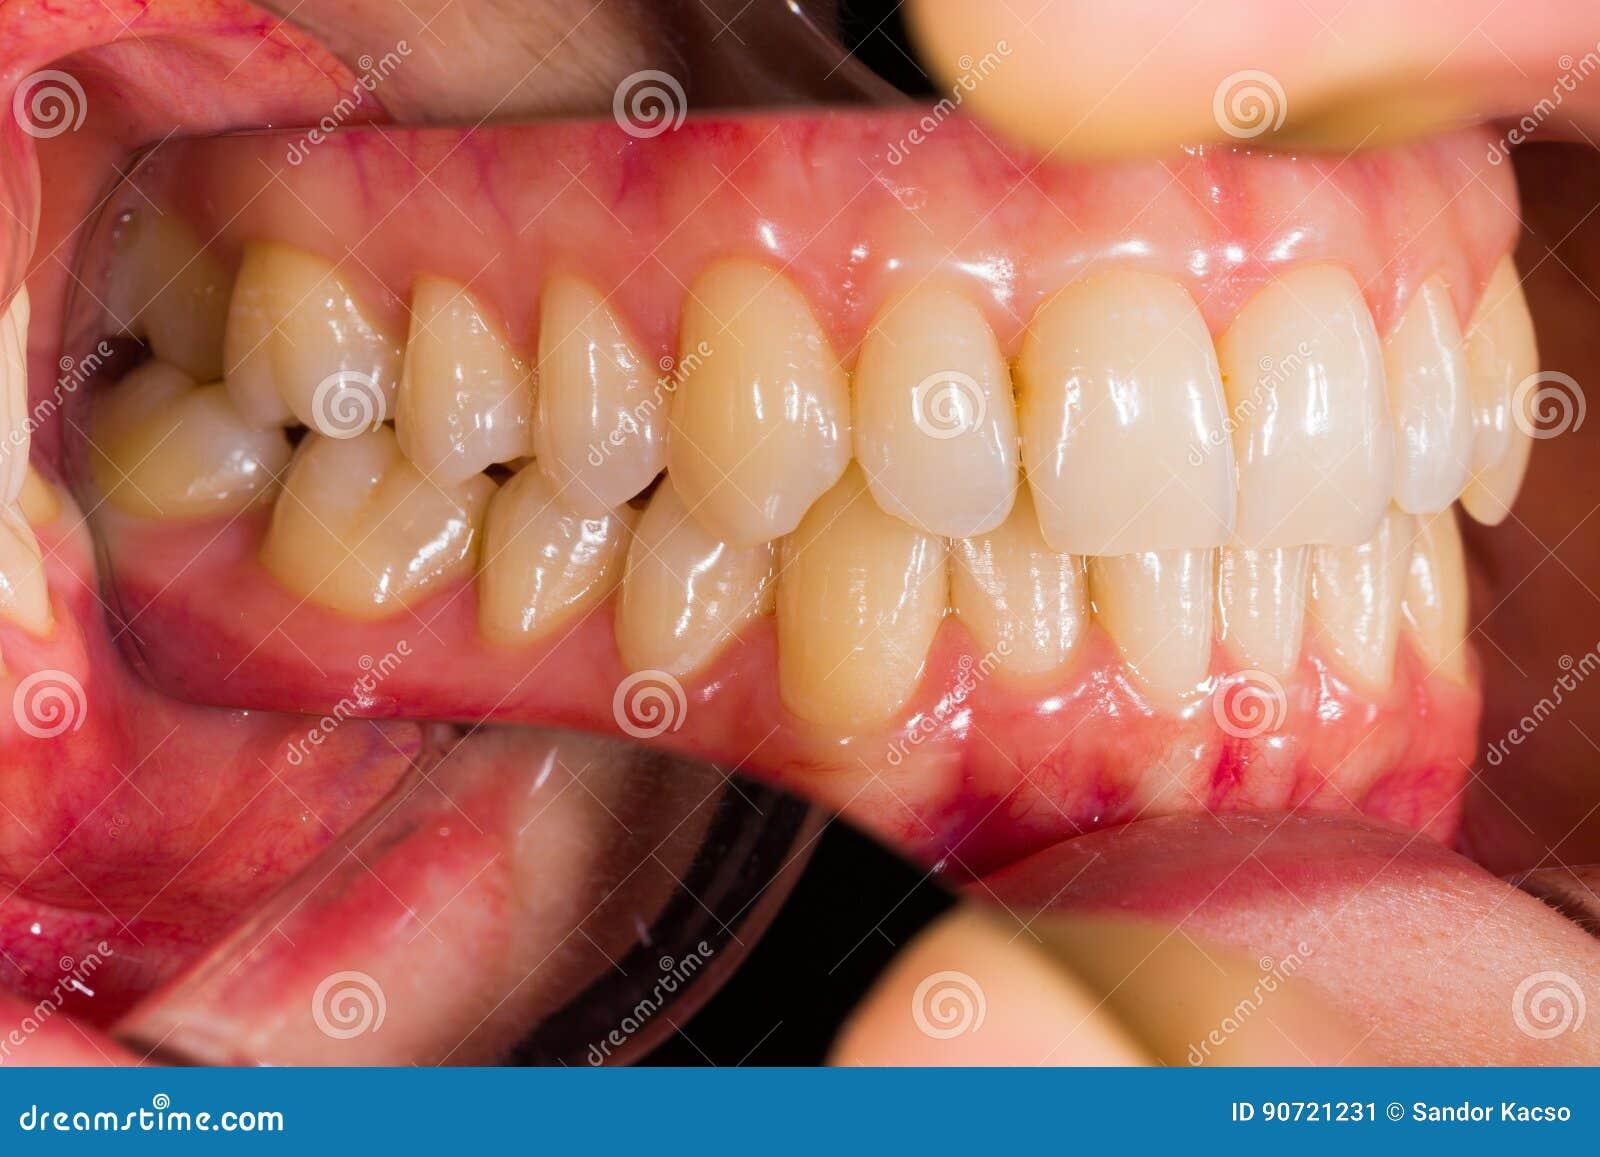 Anatomía dental imagen de archivo. Imagen de hecho, hembra - 90721231